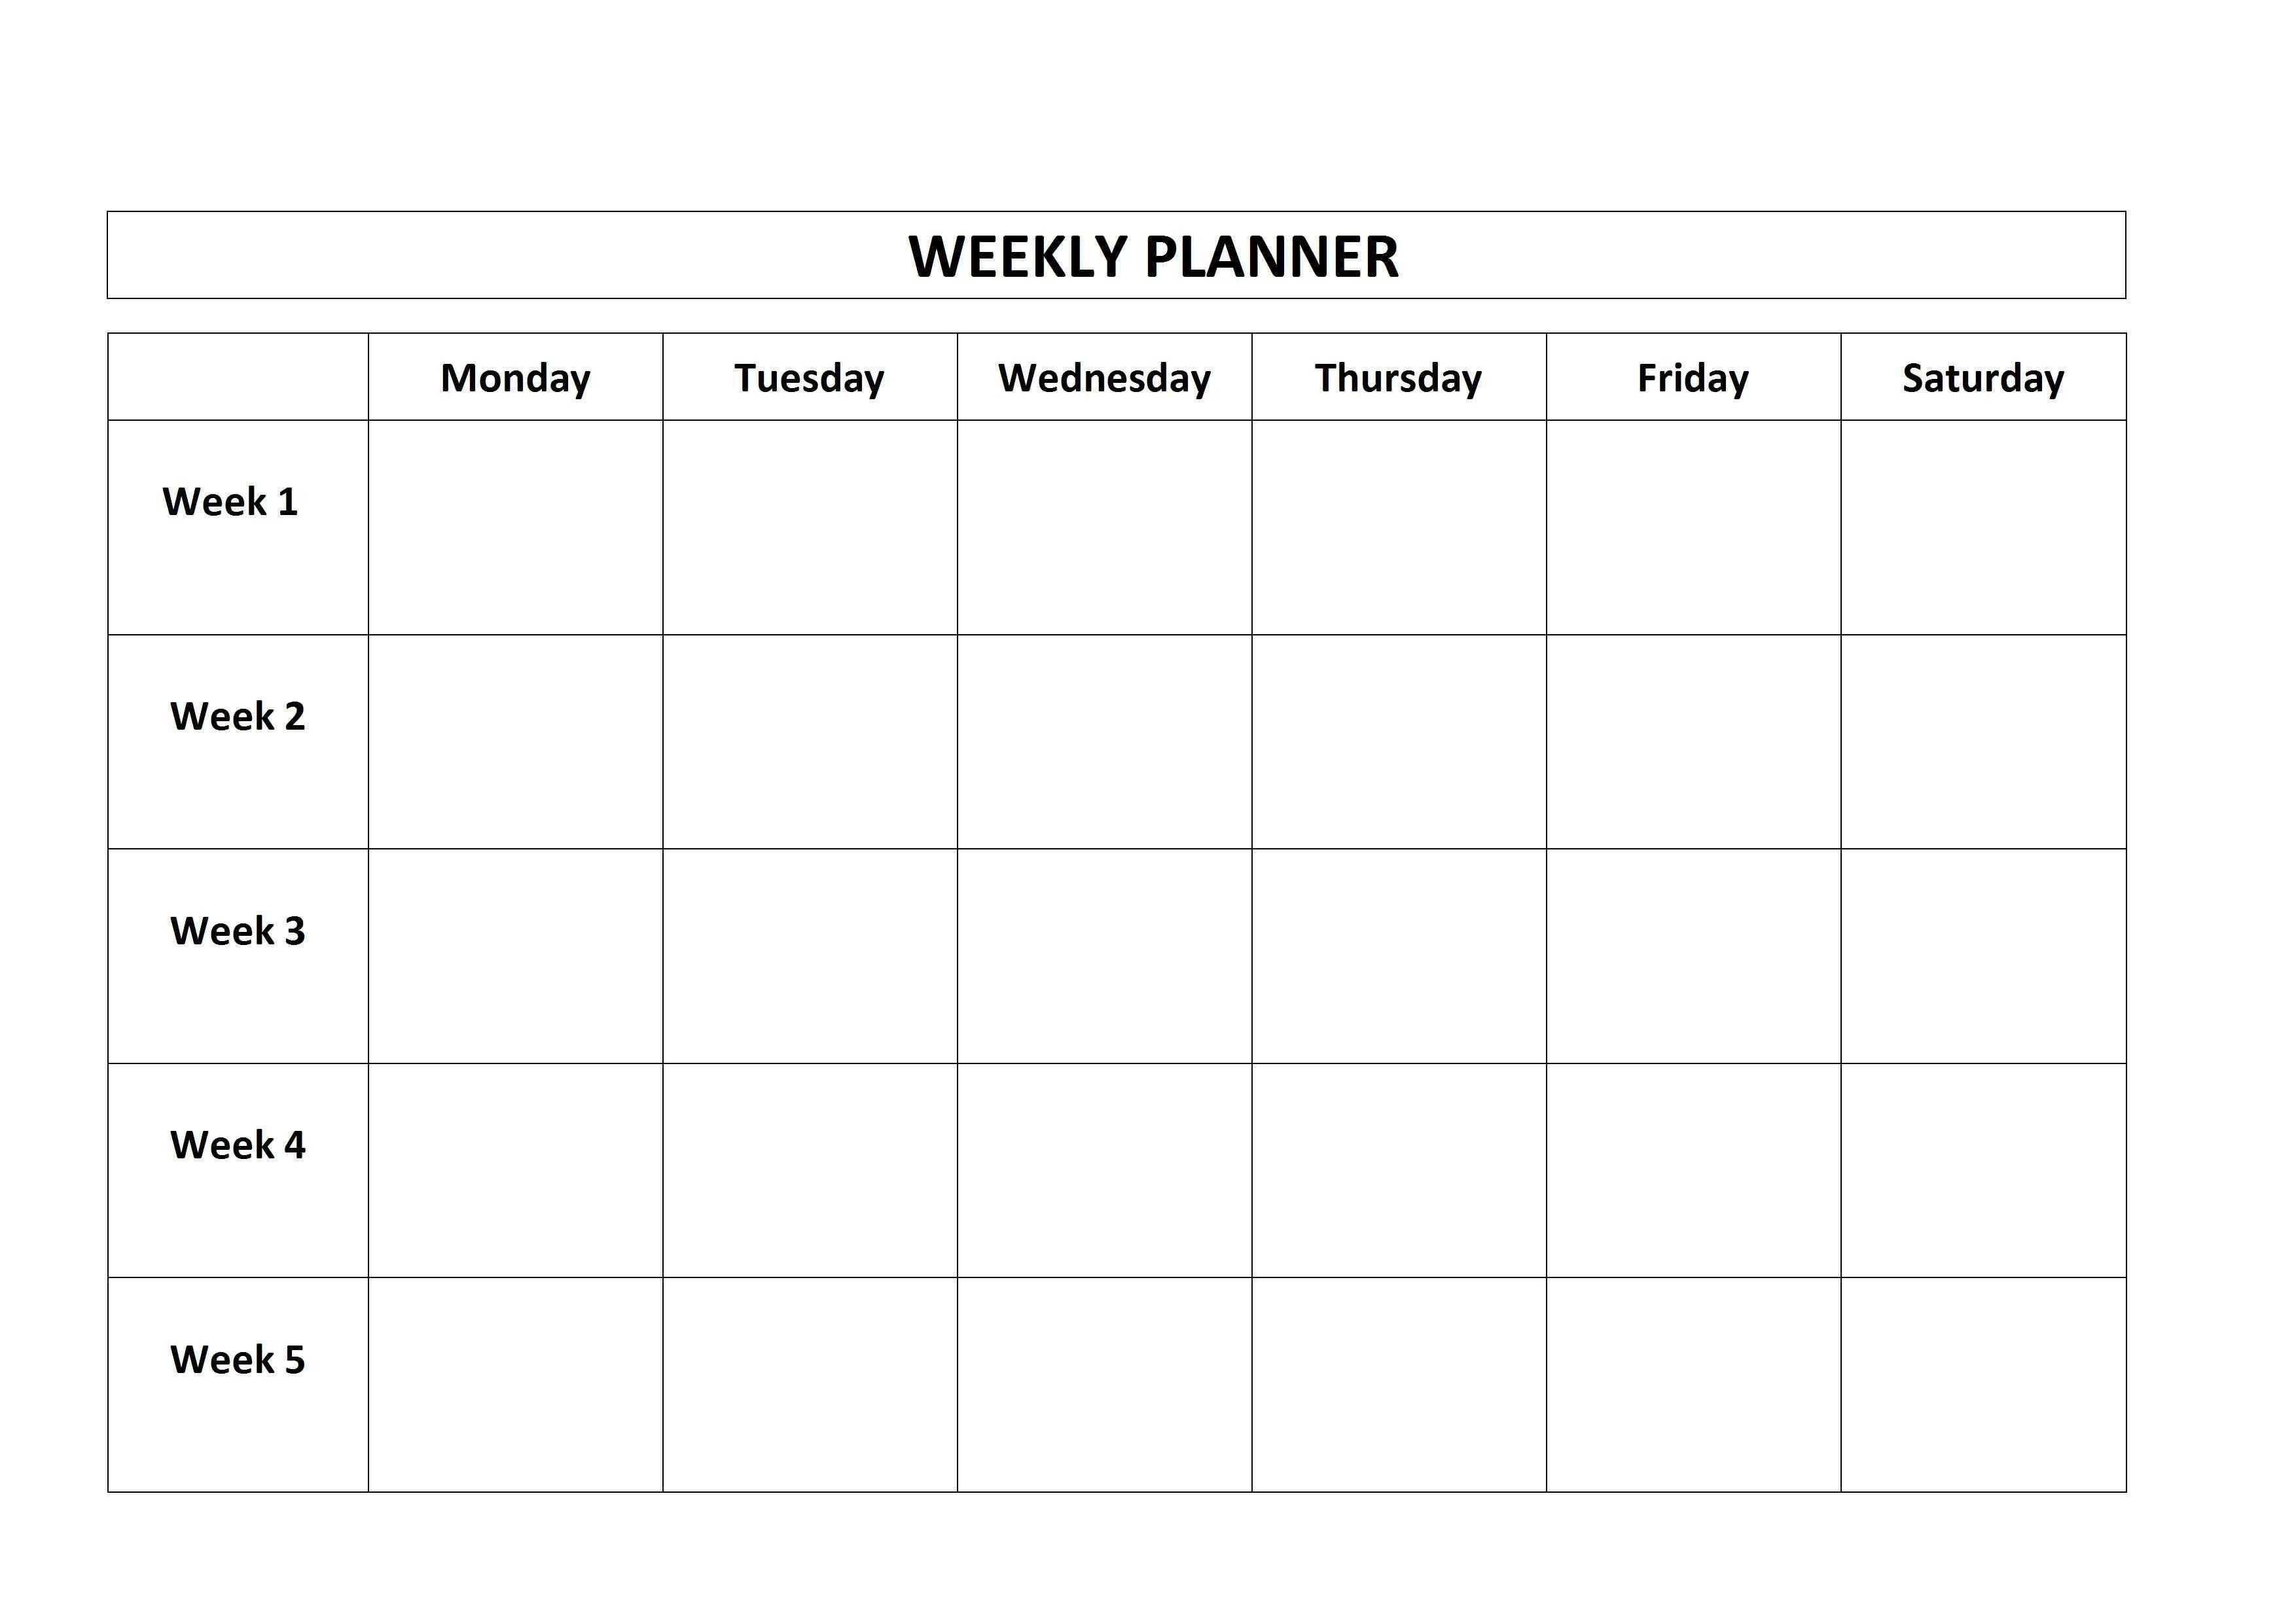 5 Day Calendar Template - Vaydile.euforic.co-Blank Calendar Template pertaining to 5 School Day Calendar Blank